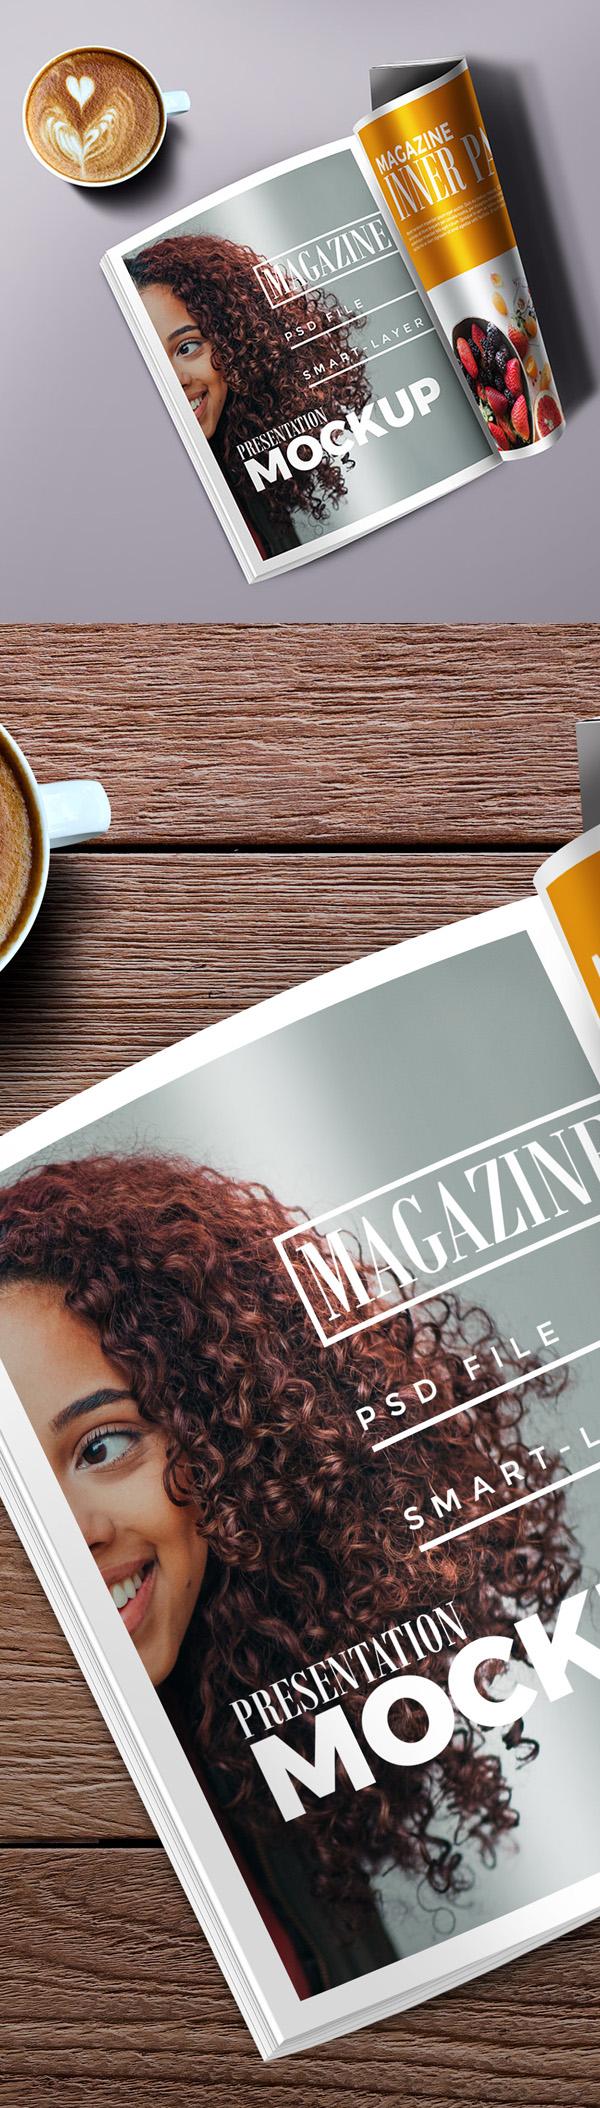 Free Hi-res Magazine Mockup PSD